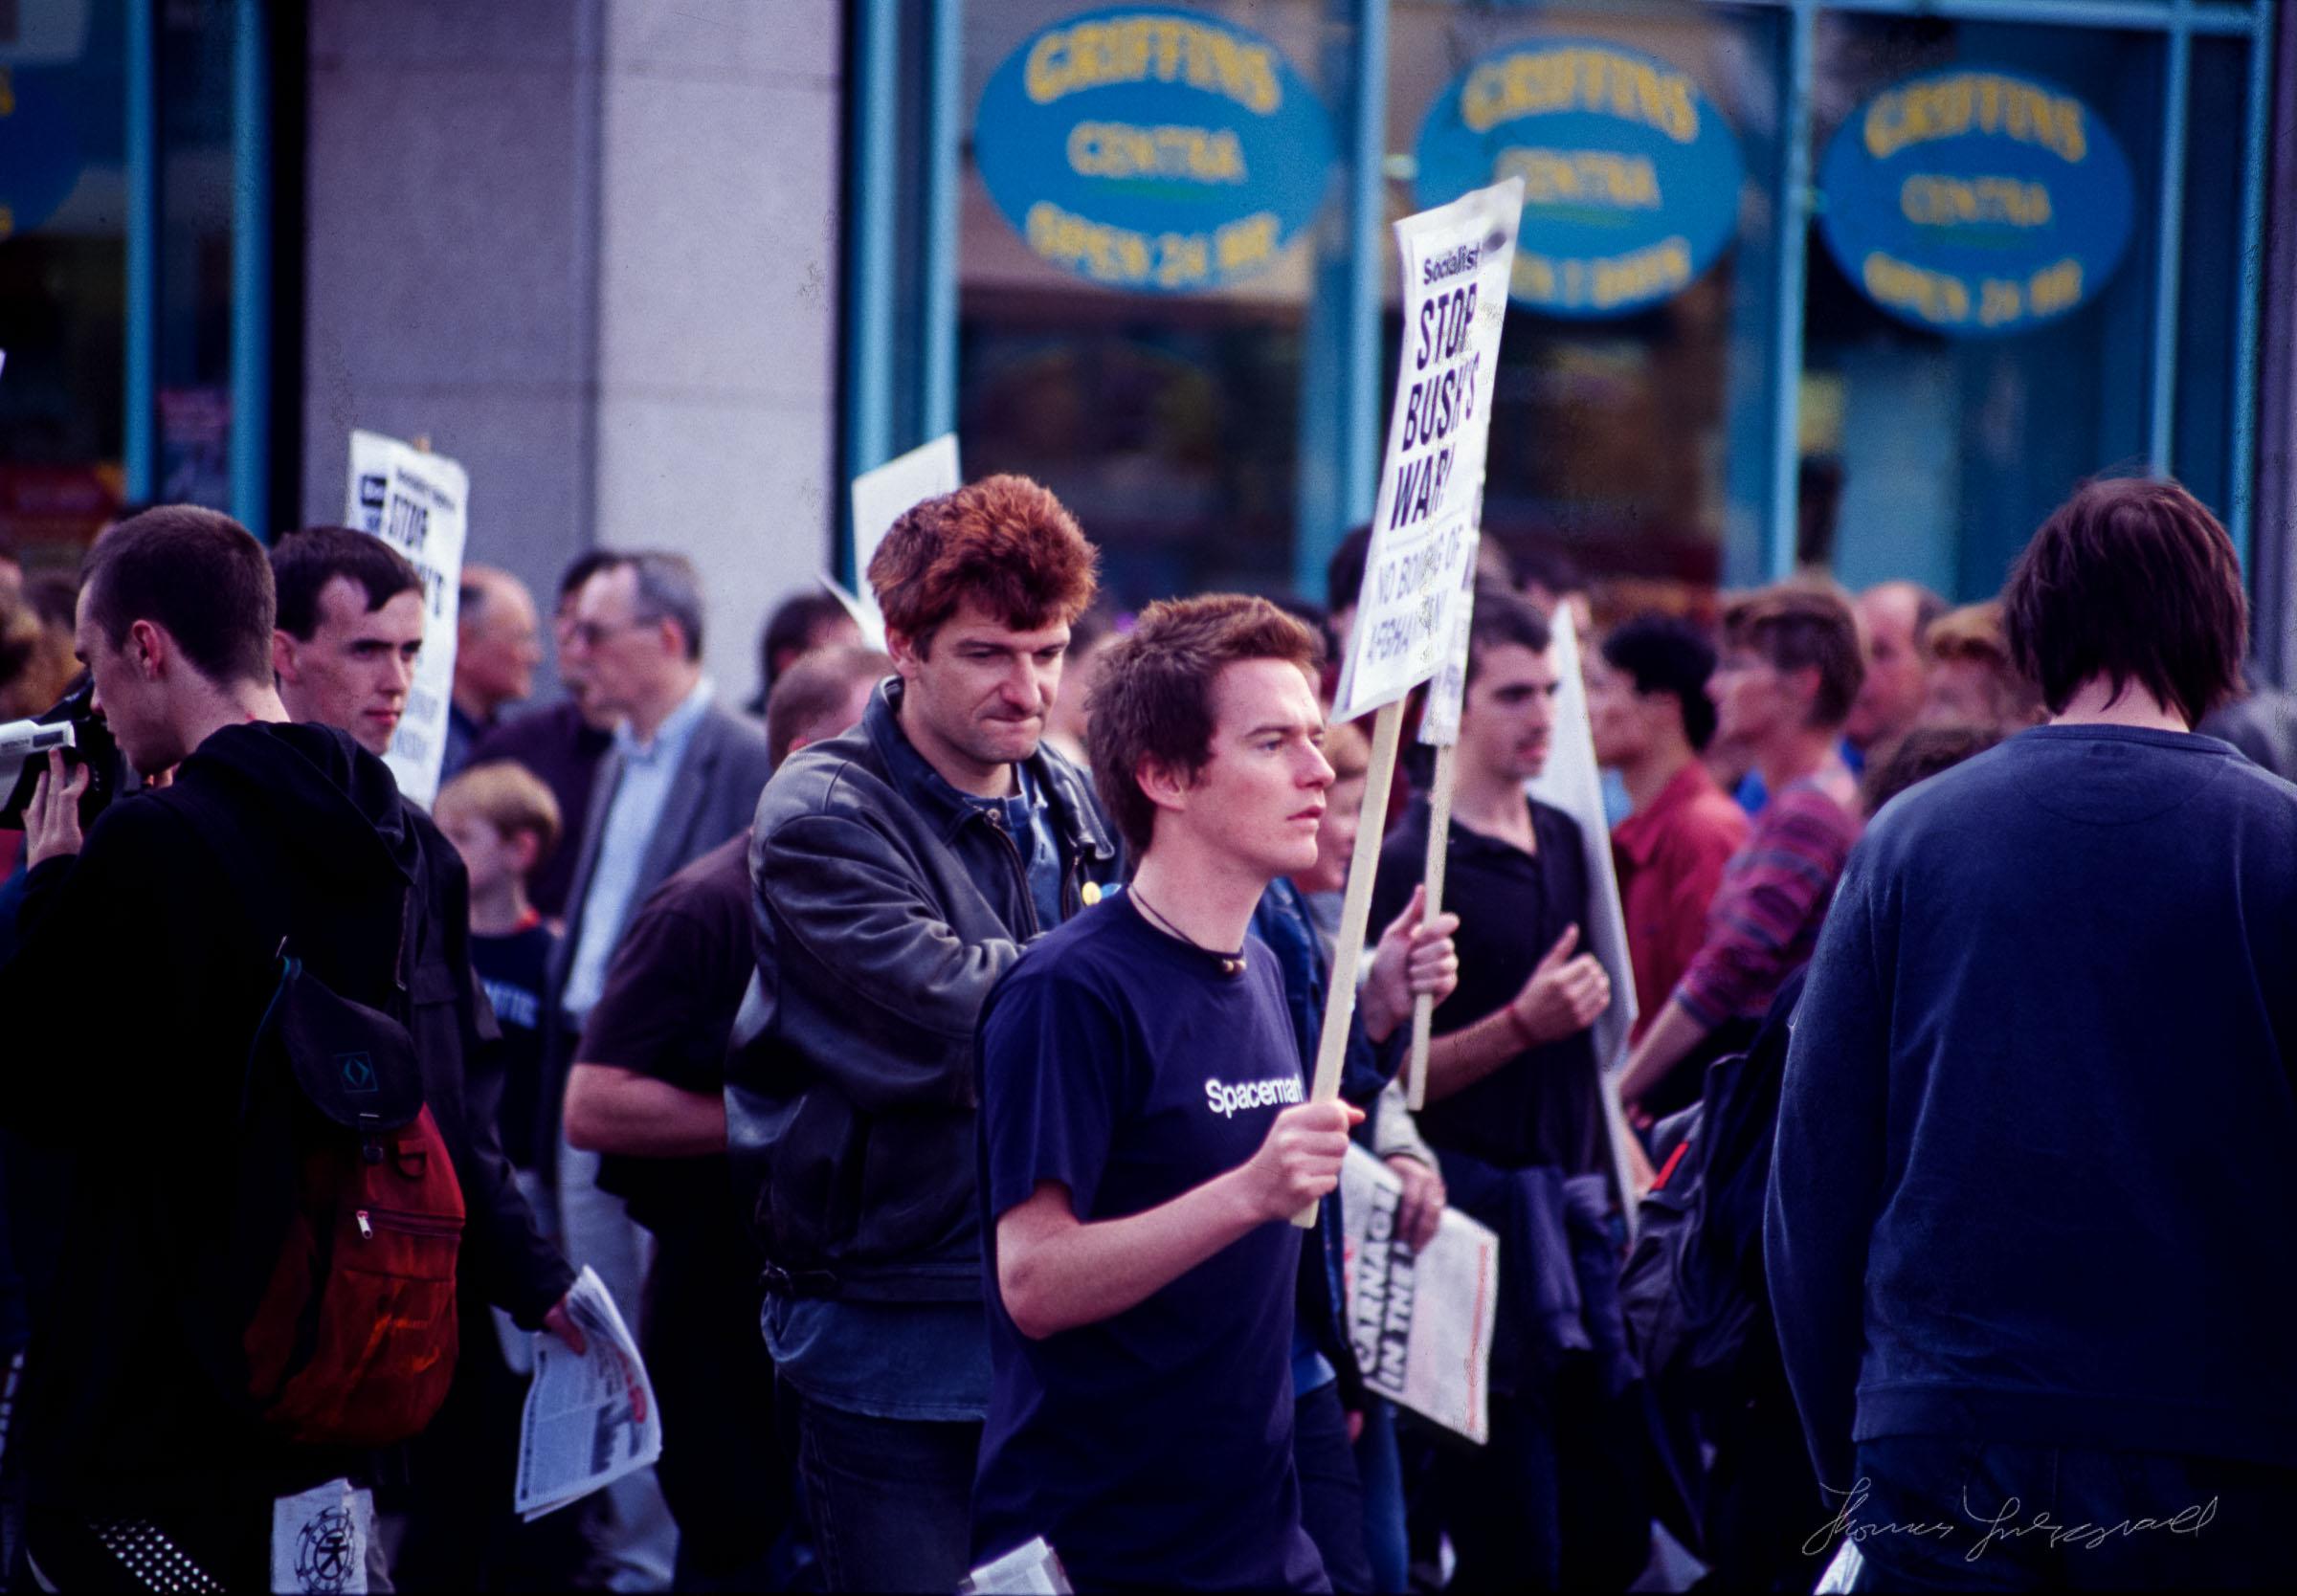 war-protest2.jpg